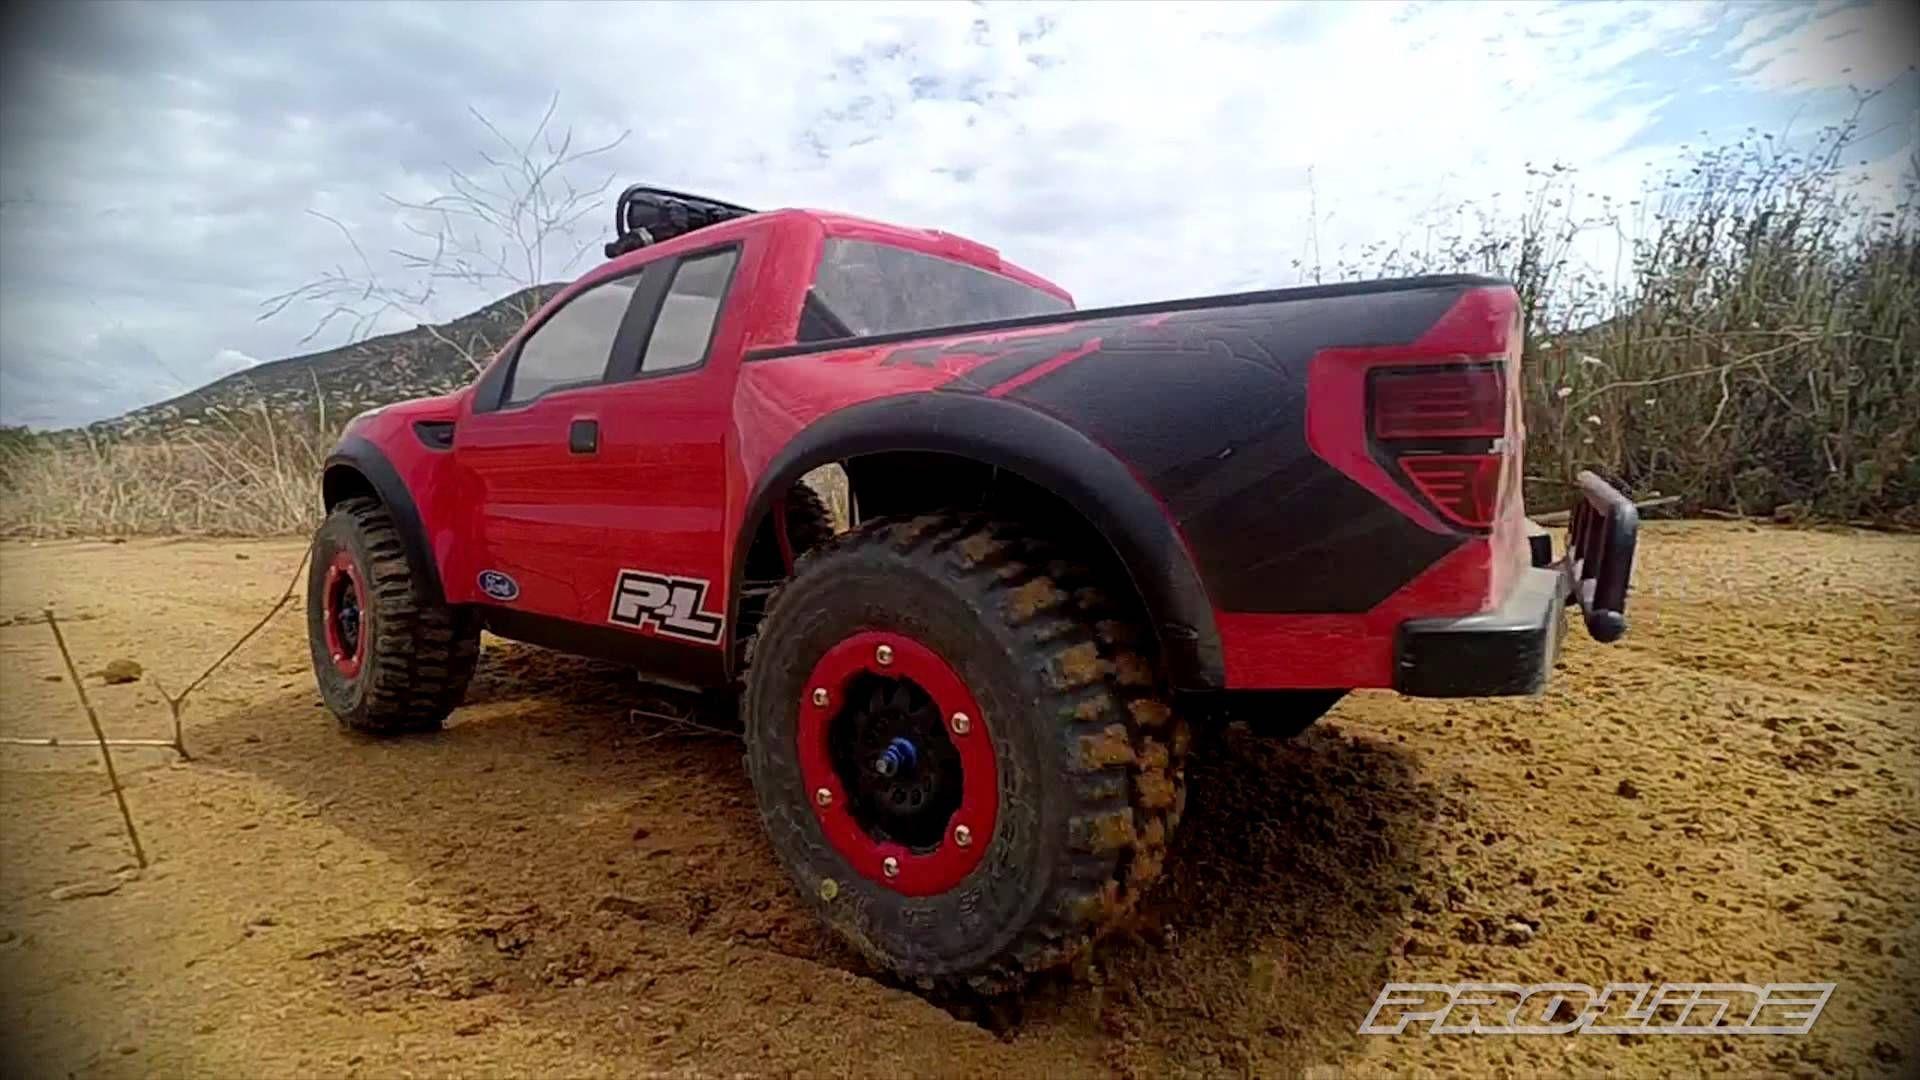 Ford Raptor with Proline trenchers Traxxas Radio control cars E Revo Pinterest